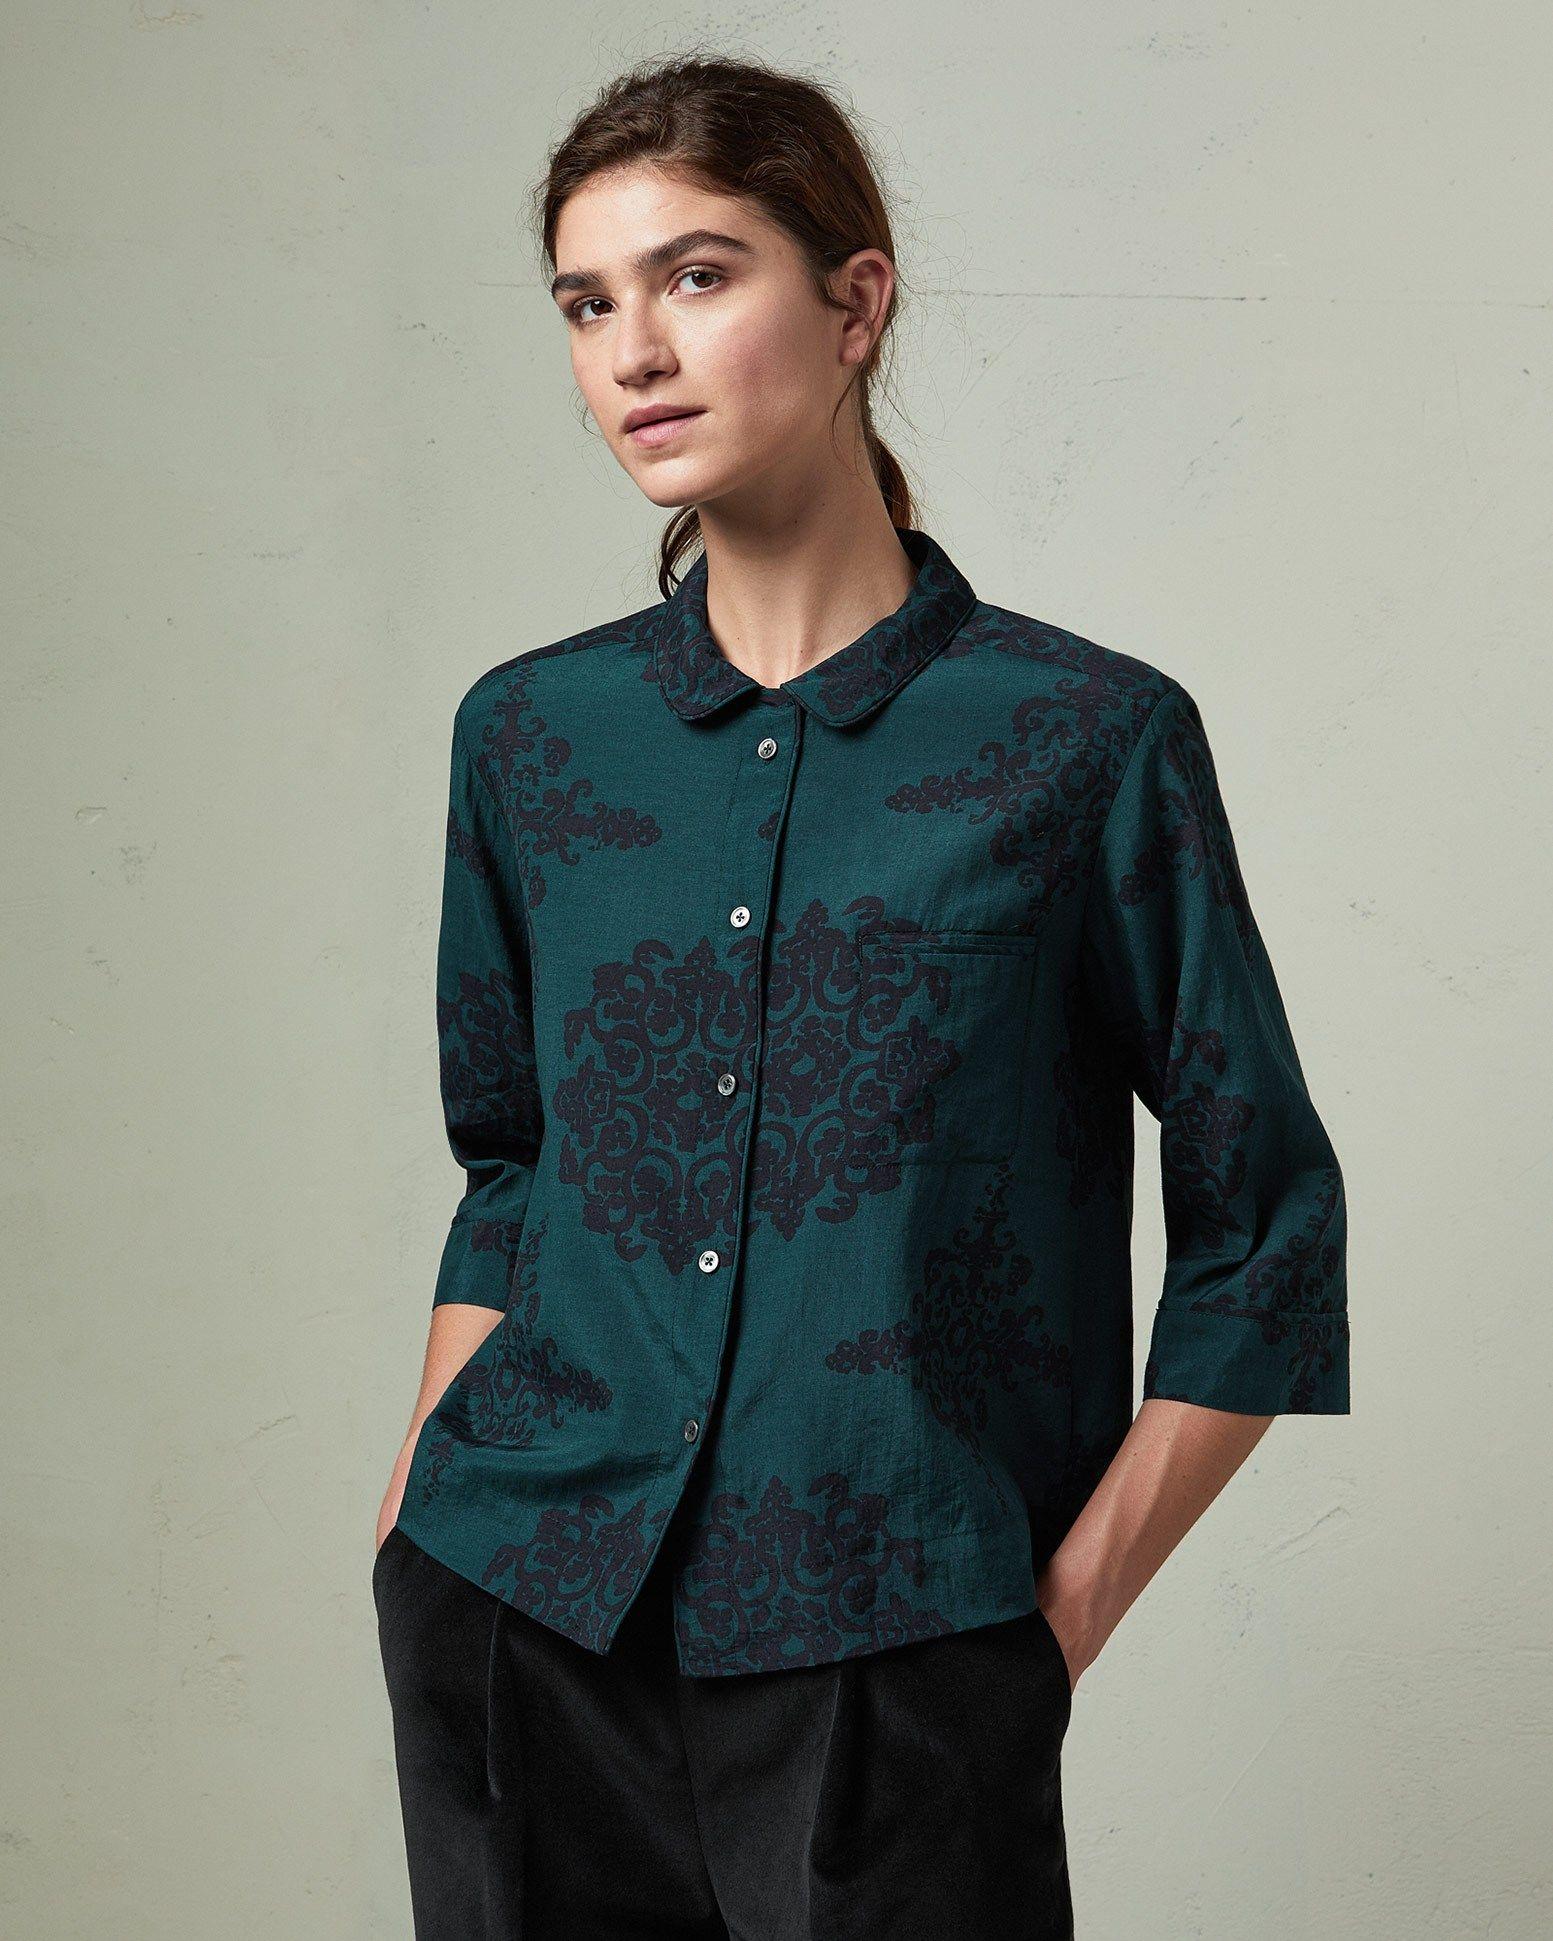 2ba92dfae toast heze print pj shirt | wantable things | Mens tops, Fashion ...